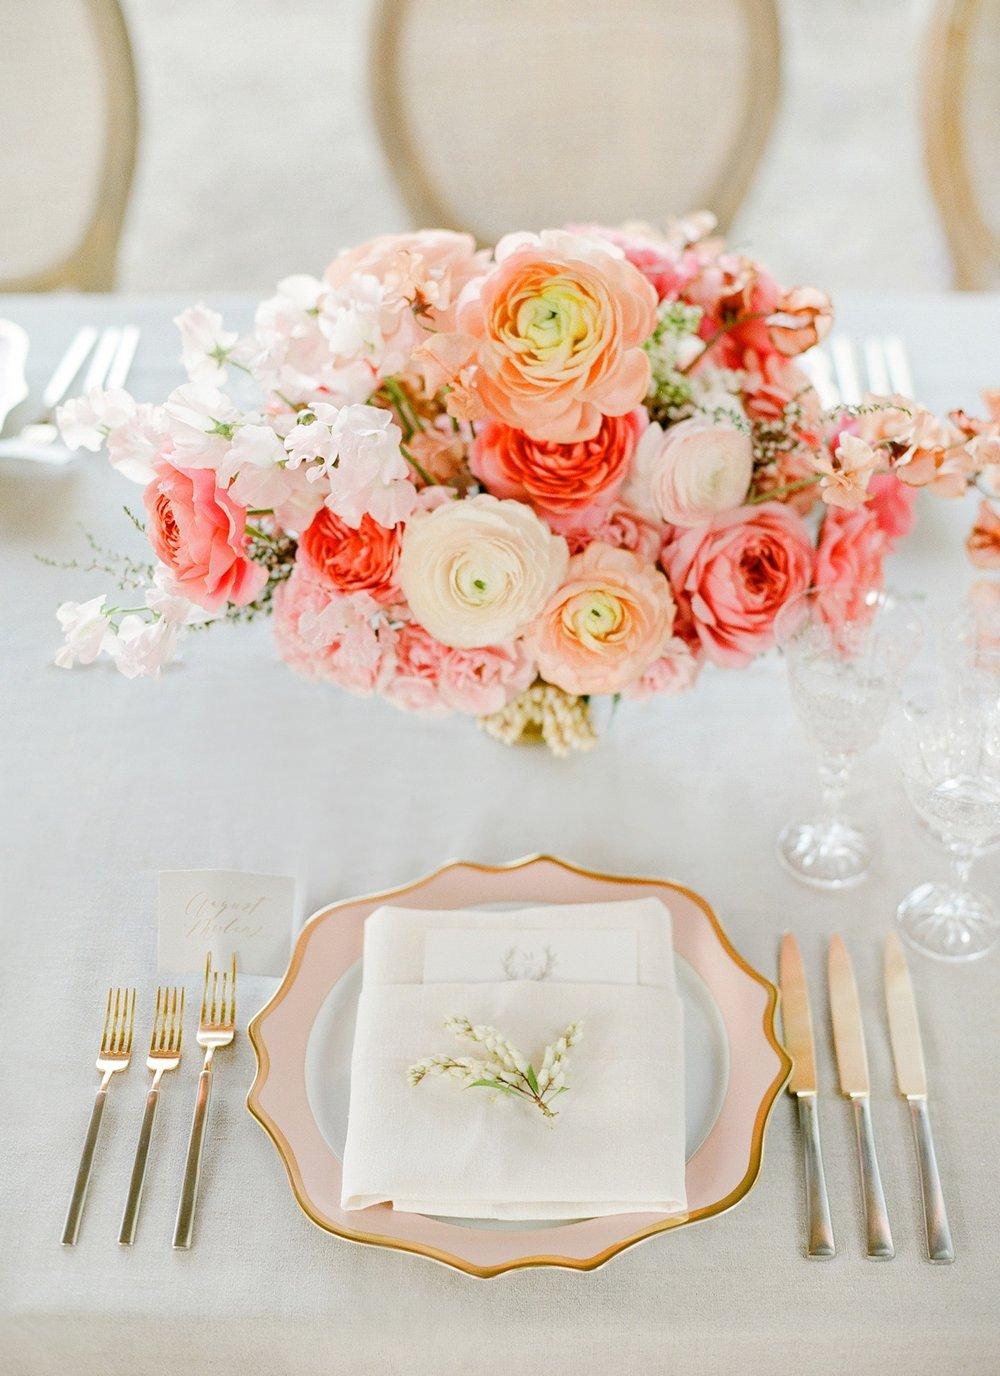 47_casa-de-perrin-pink-plates-weddings.jpg